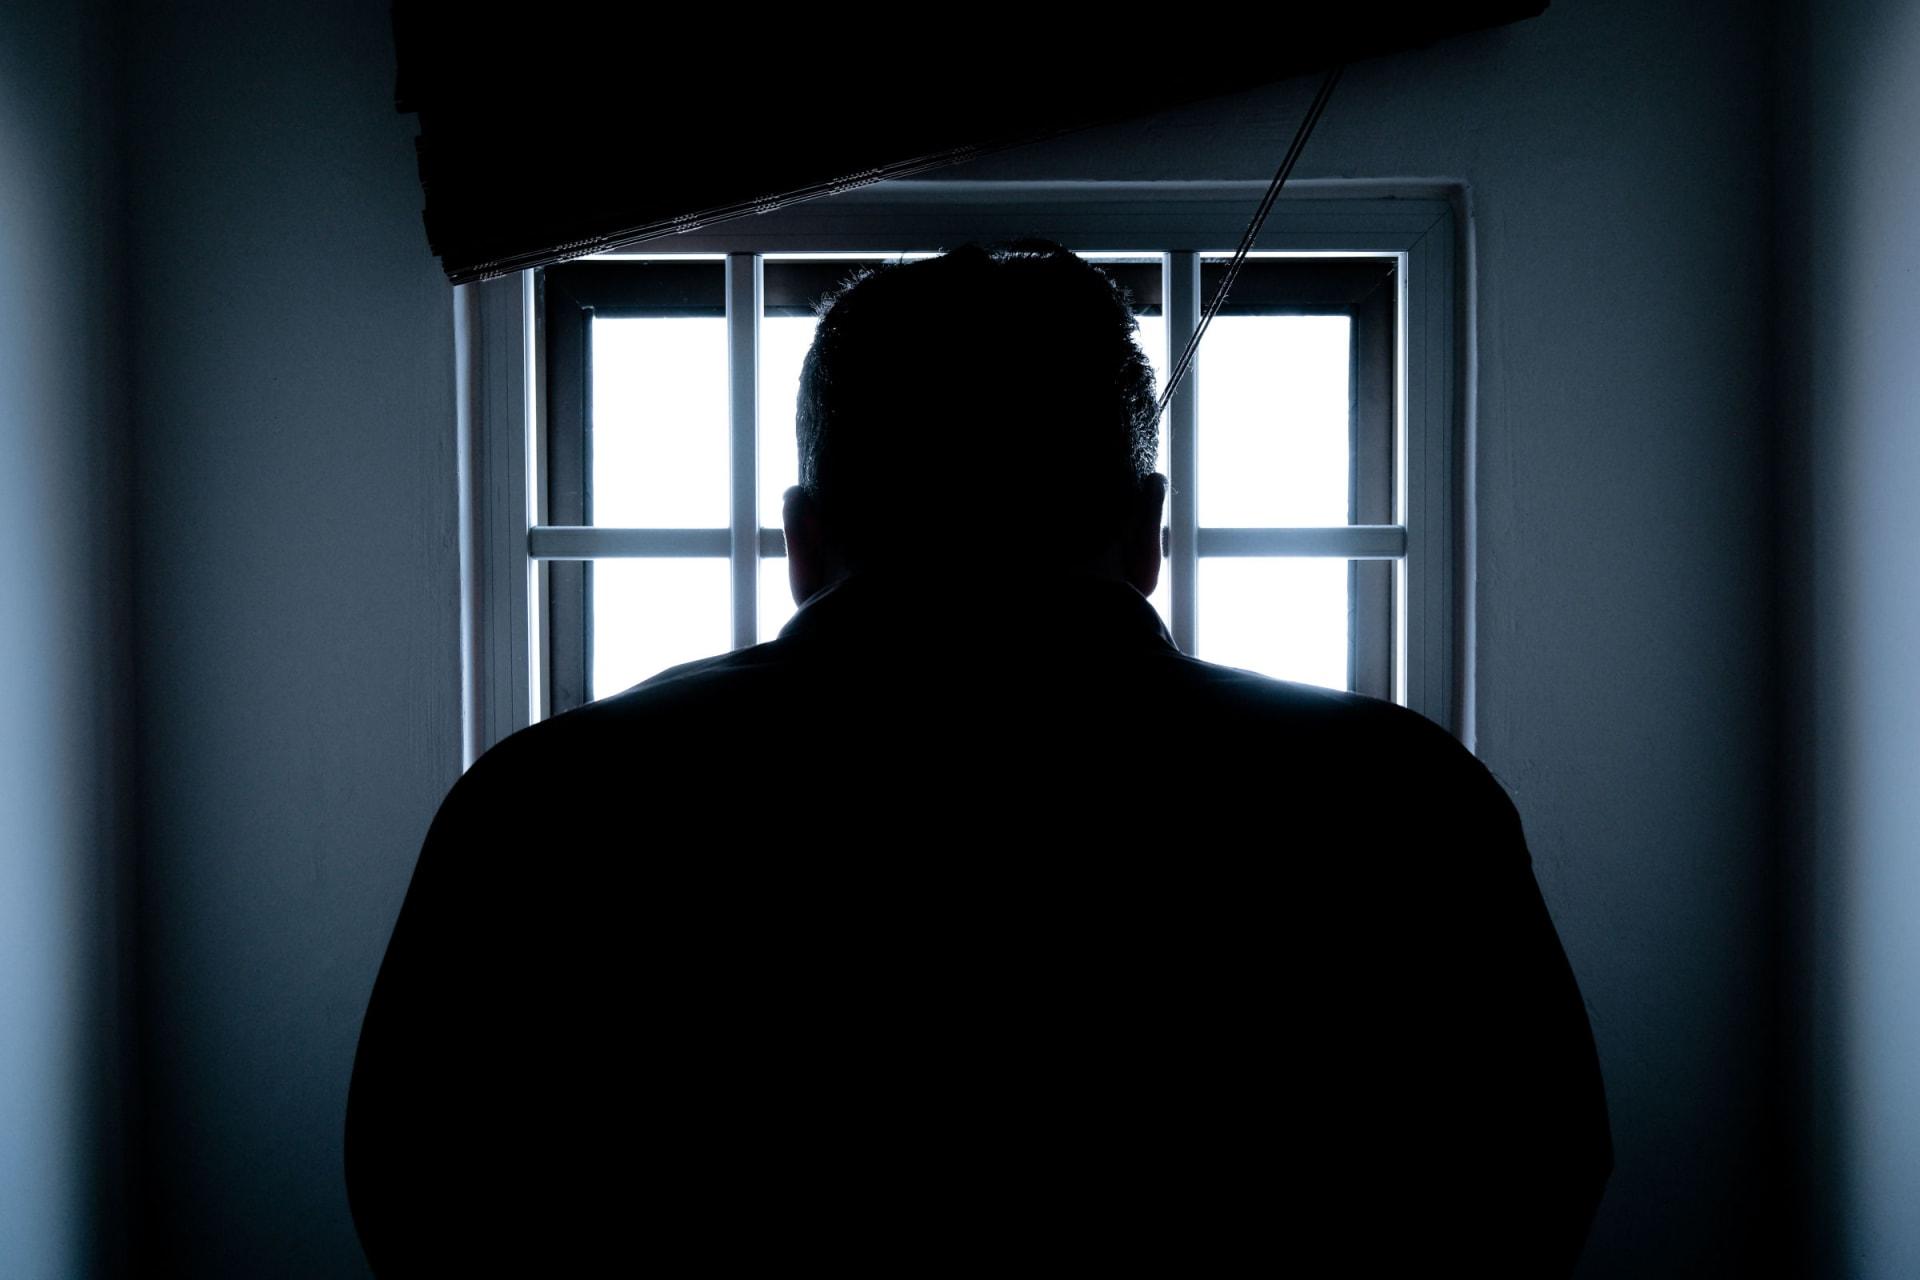 PA Pedophile: State Senator Folmer Arrested for Child Porn